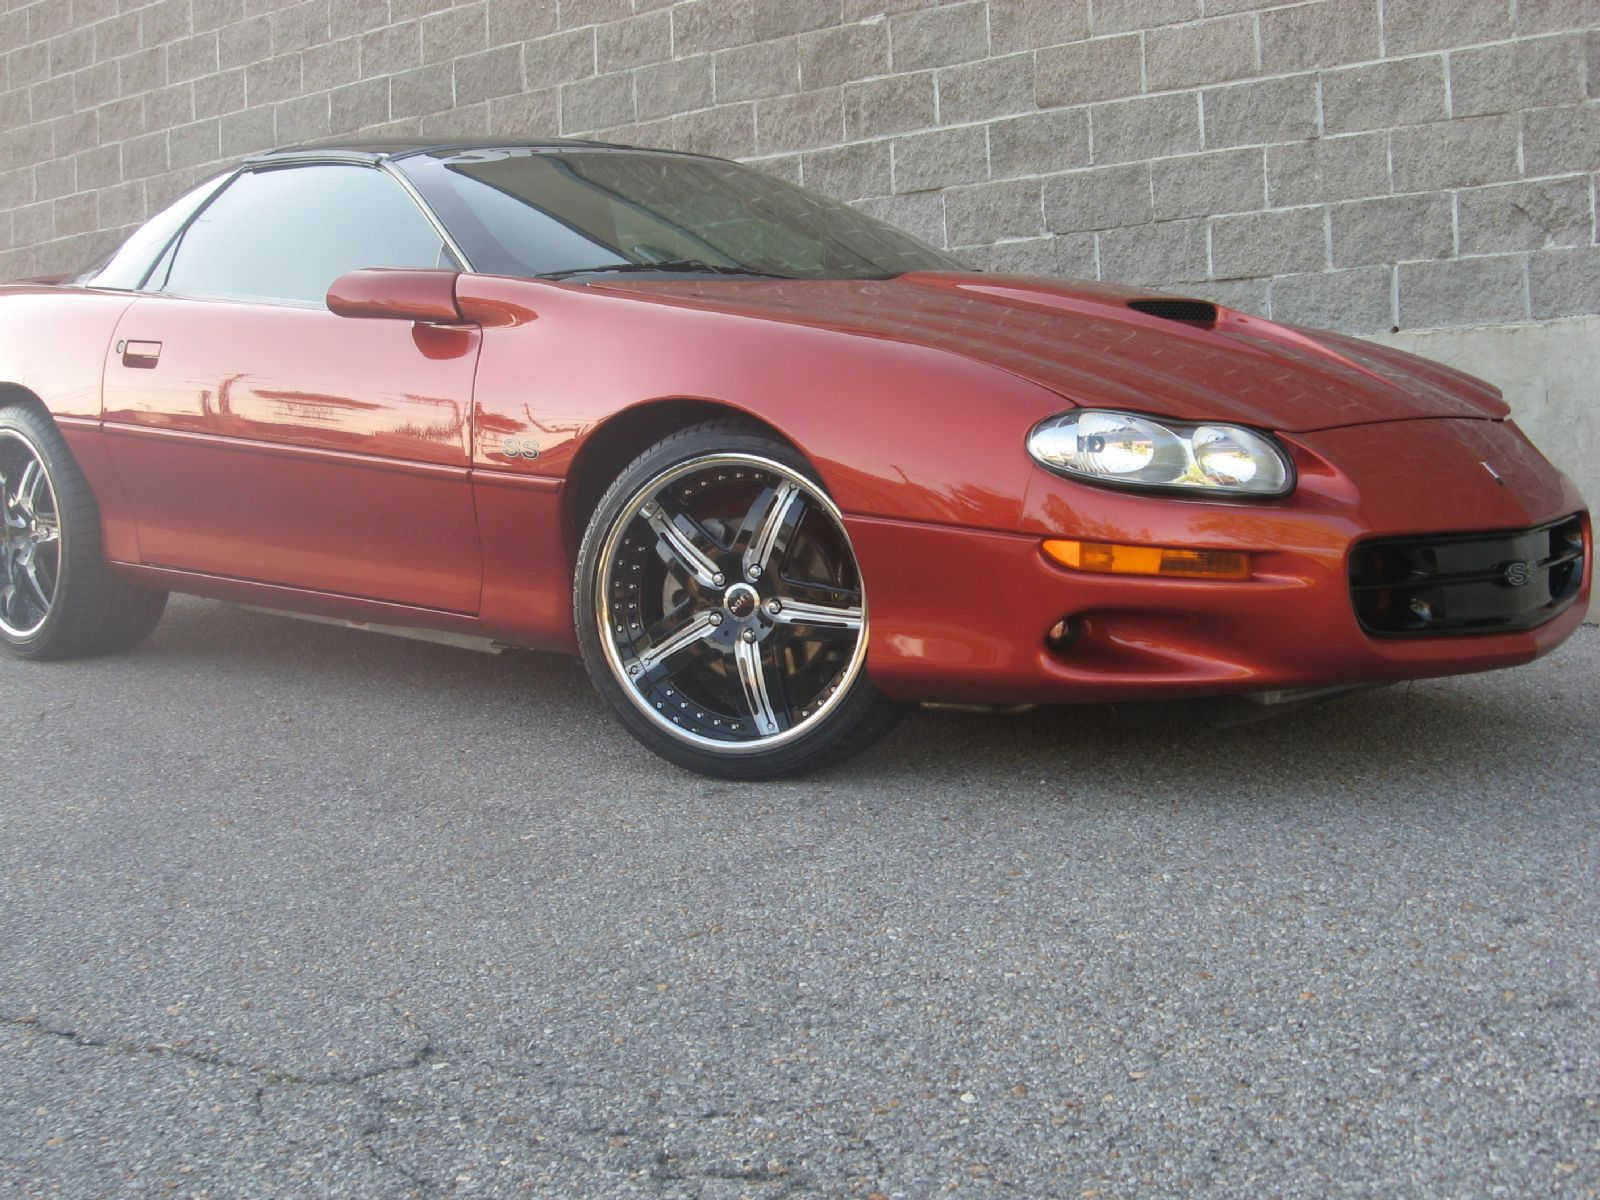 2002 chevrolet show street race custom camaro turbo ss. Black Bedroom Furniture Sets. Home Design Ideas